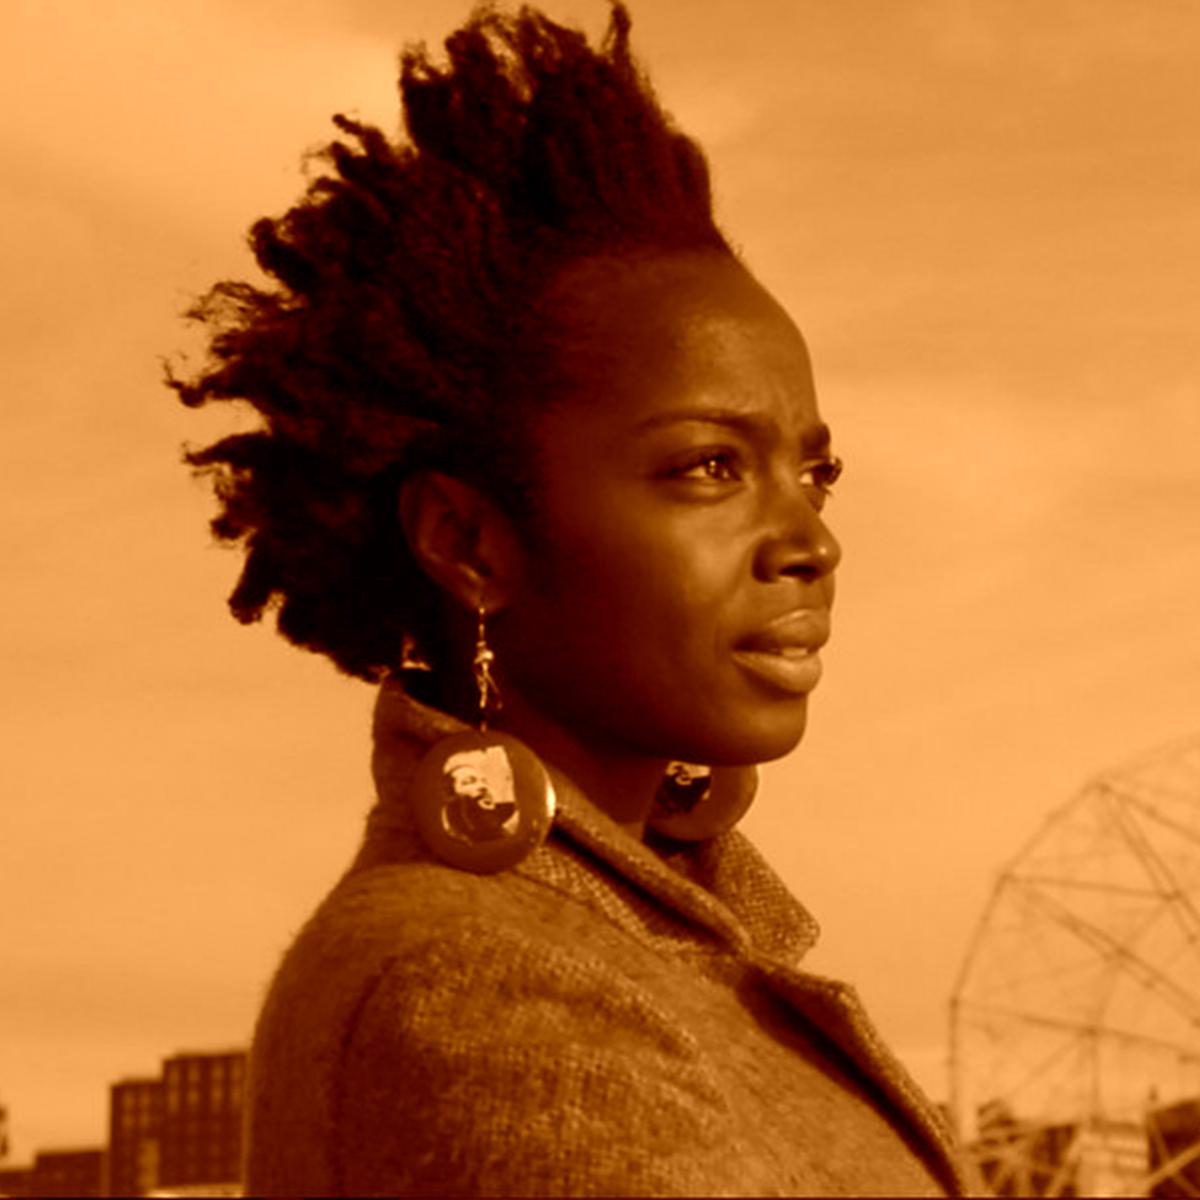 Nigerian director Iquo B. Essien - MaameYaa Boafo in New York I Love You